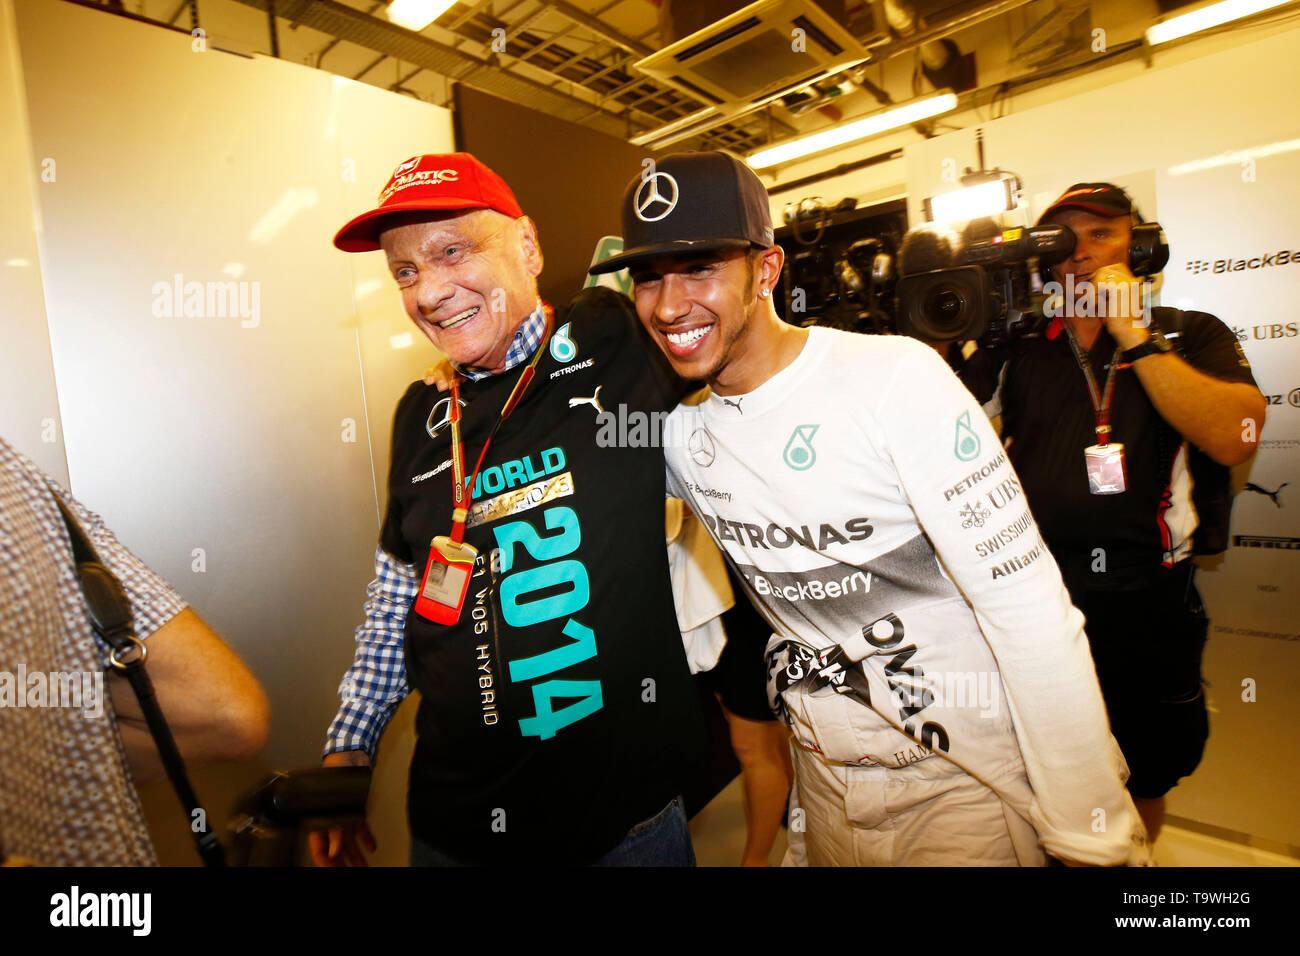 Motorsports: FIA Formula One World Championship 2014, Grand Prix of Abu Dhabi, Niki Lauda (AUT, Mercedes AMG Petronas F1 Team), # 44 Lewis Hamilton (GBR, Mercedes AMG Petronas F1 Team),   usage worldwide - Stock Image